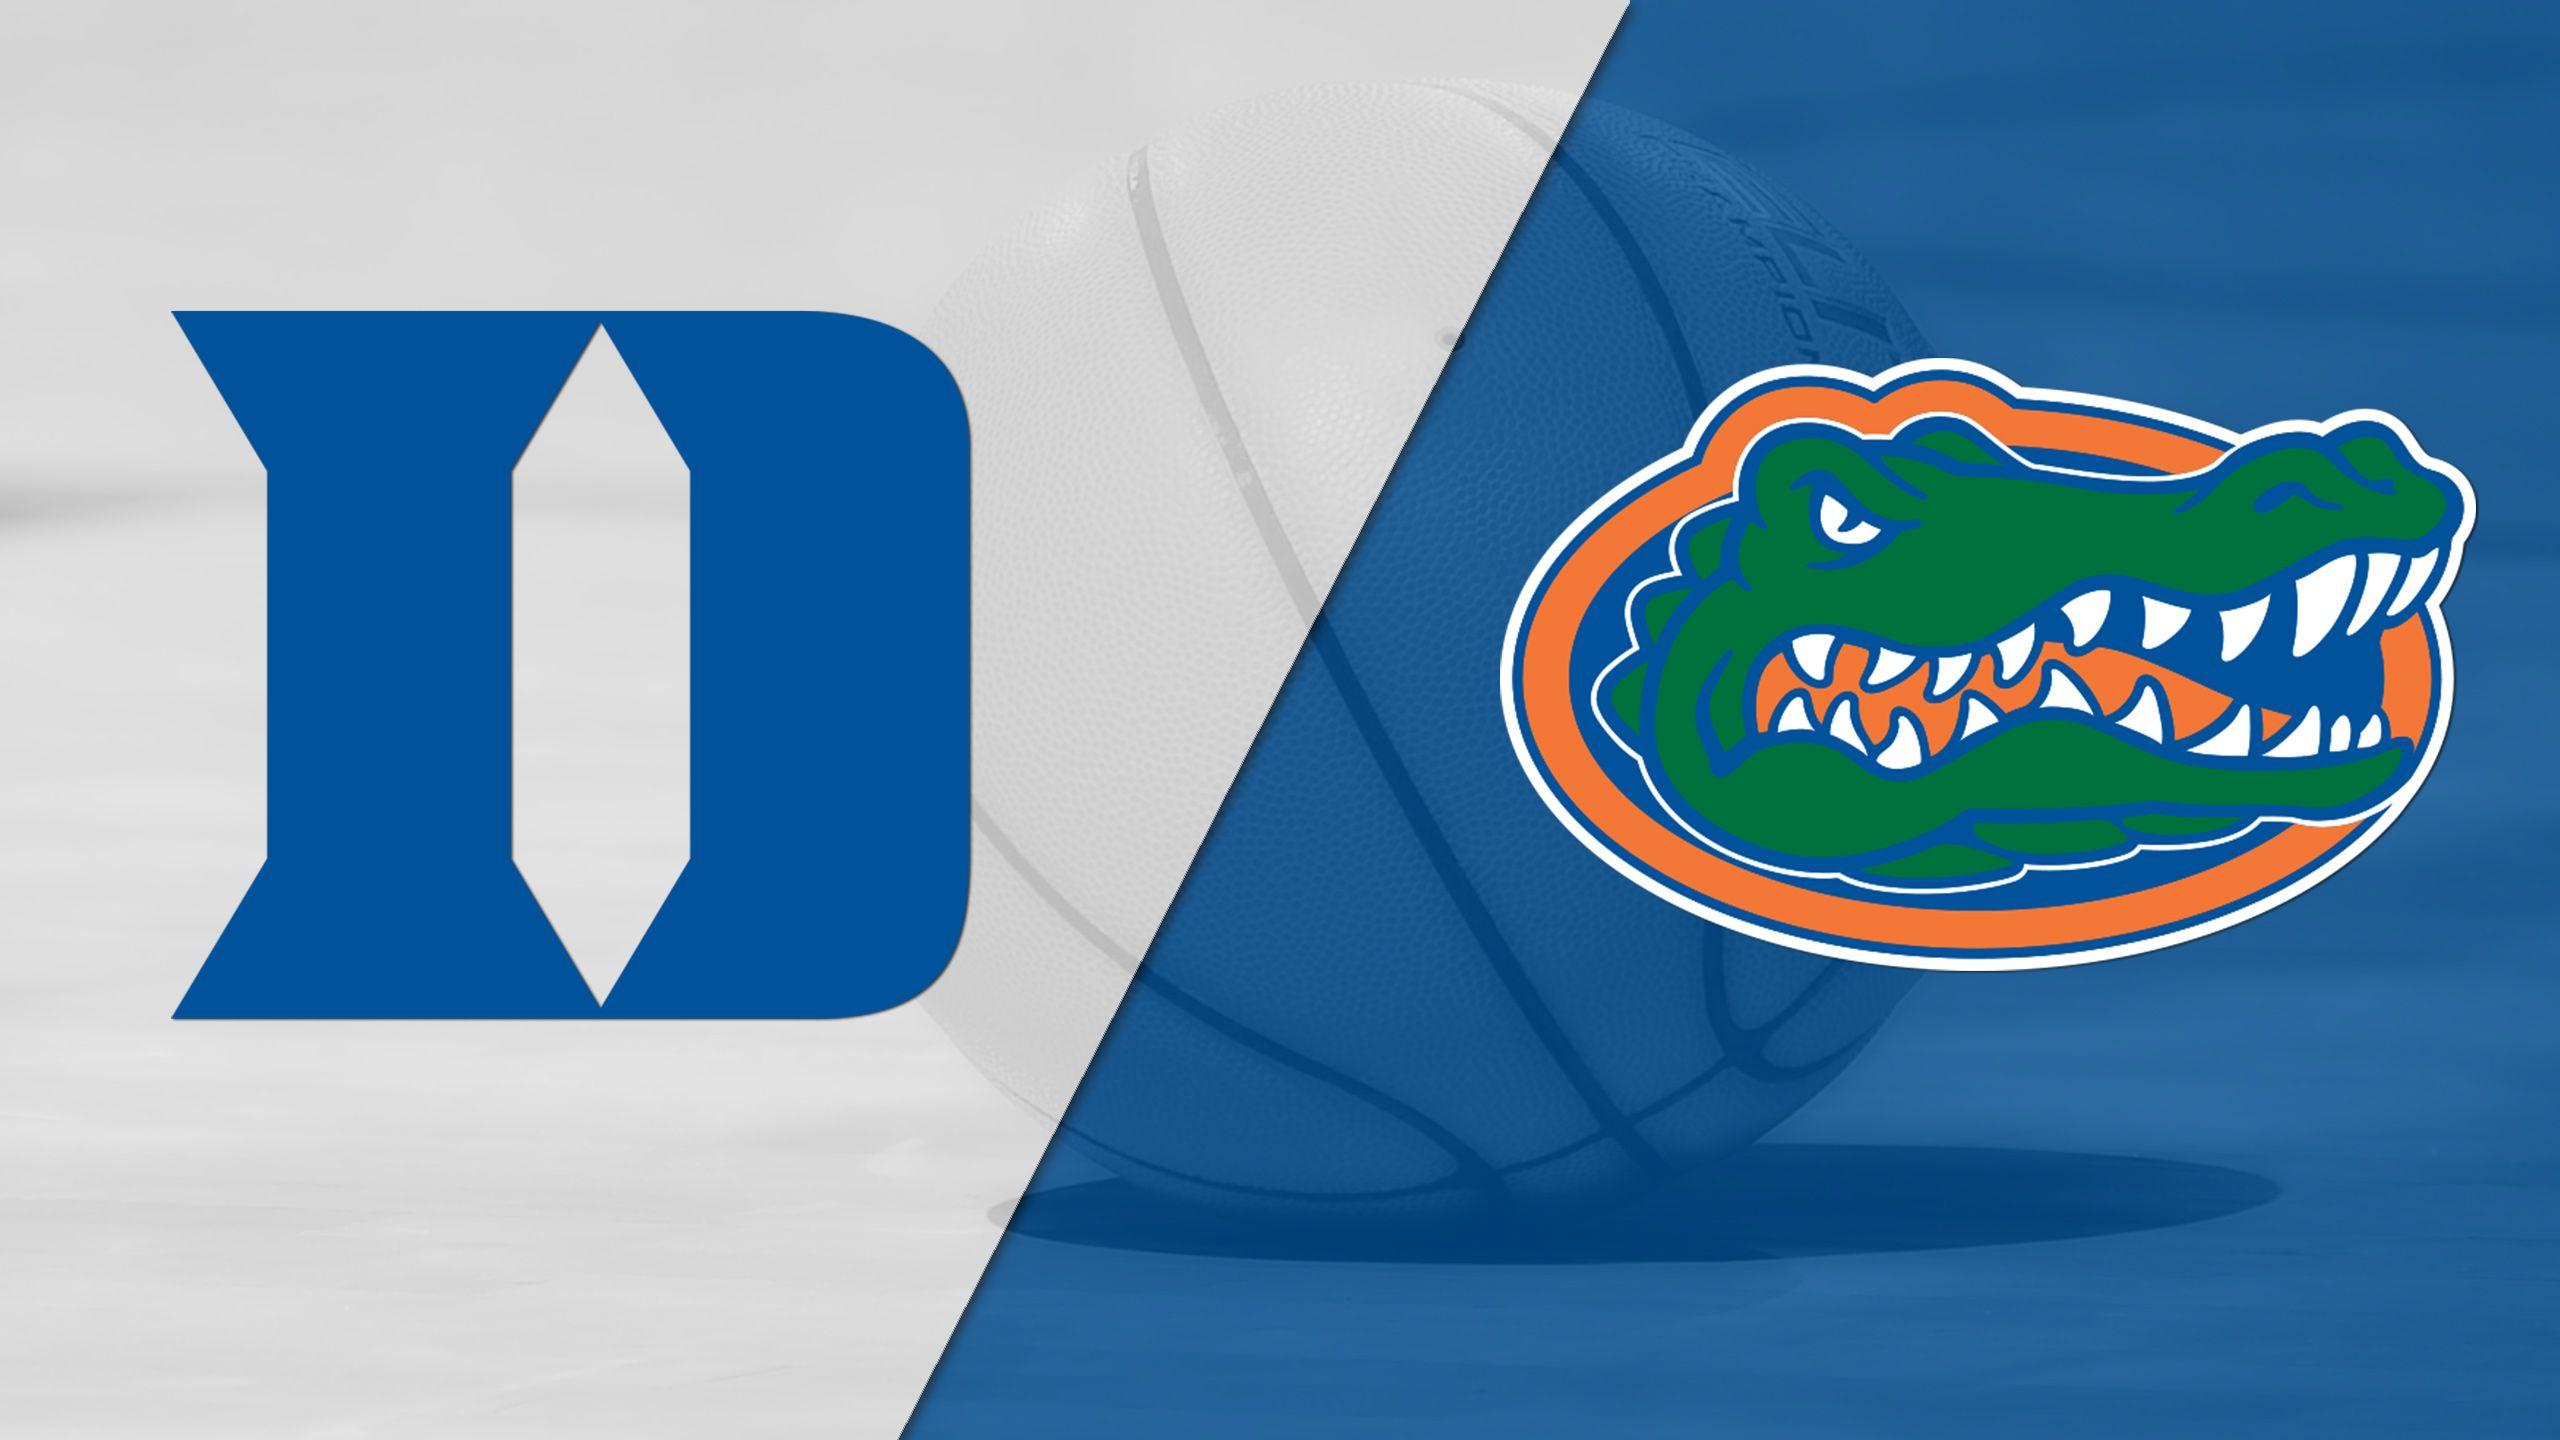 #1 Duke vs. #7 Florida (Championship) (PK80)